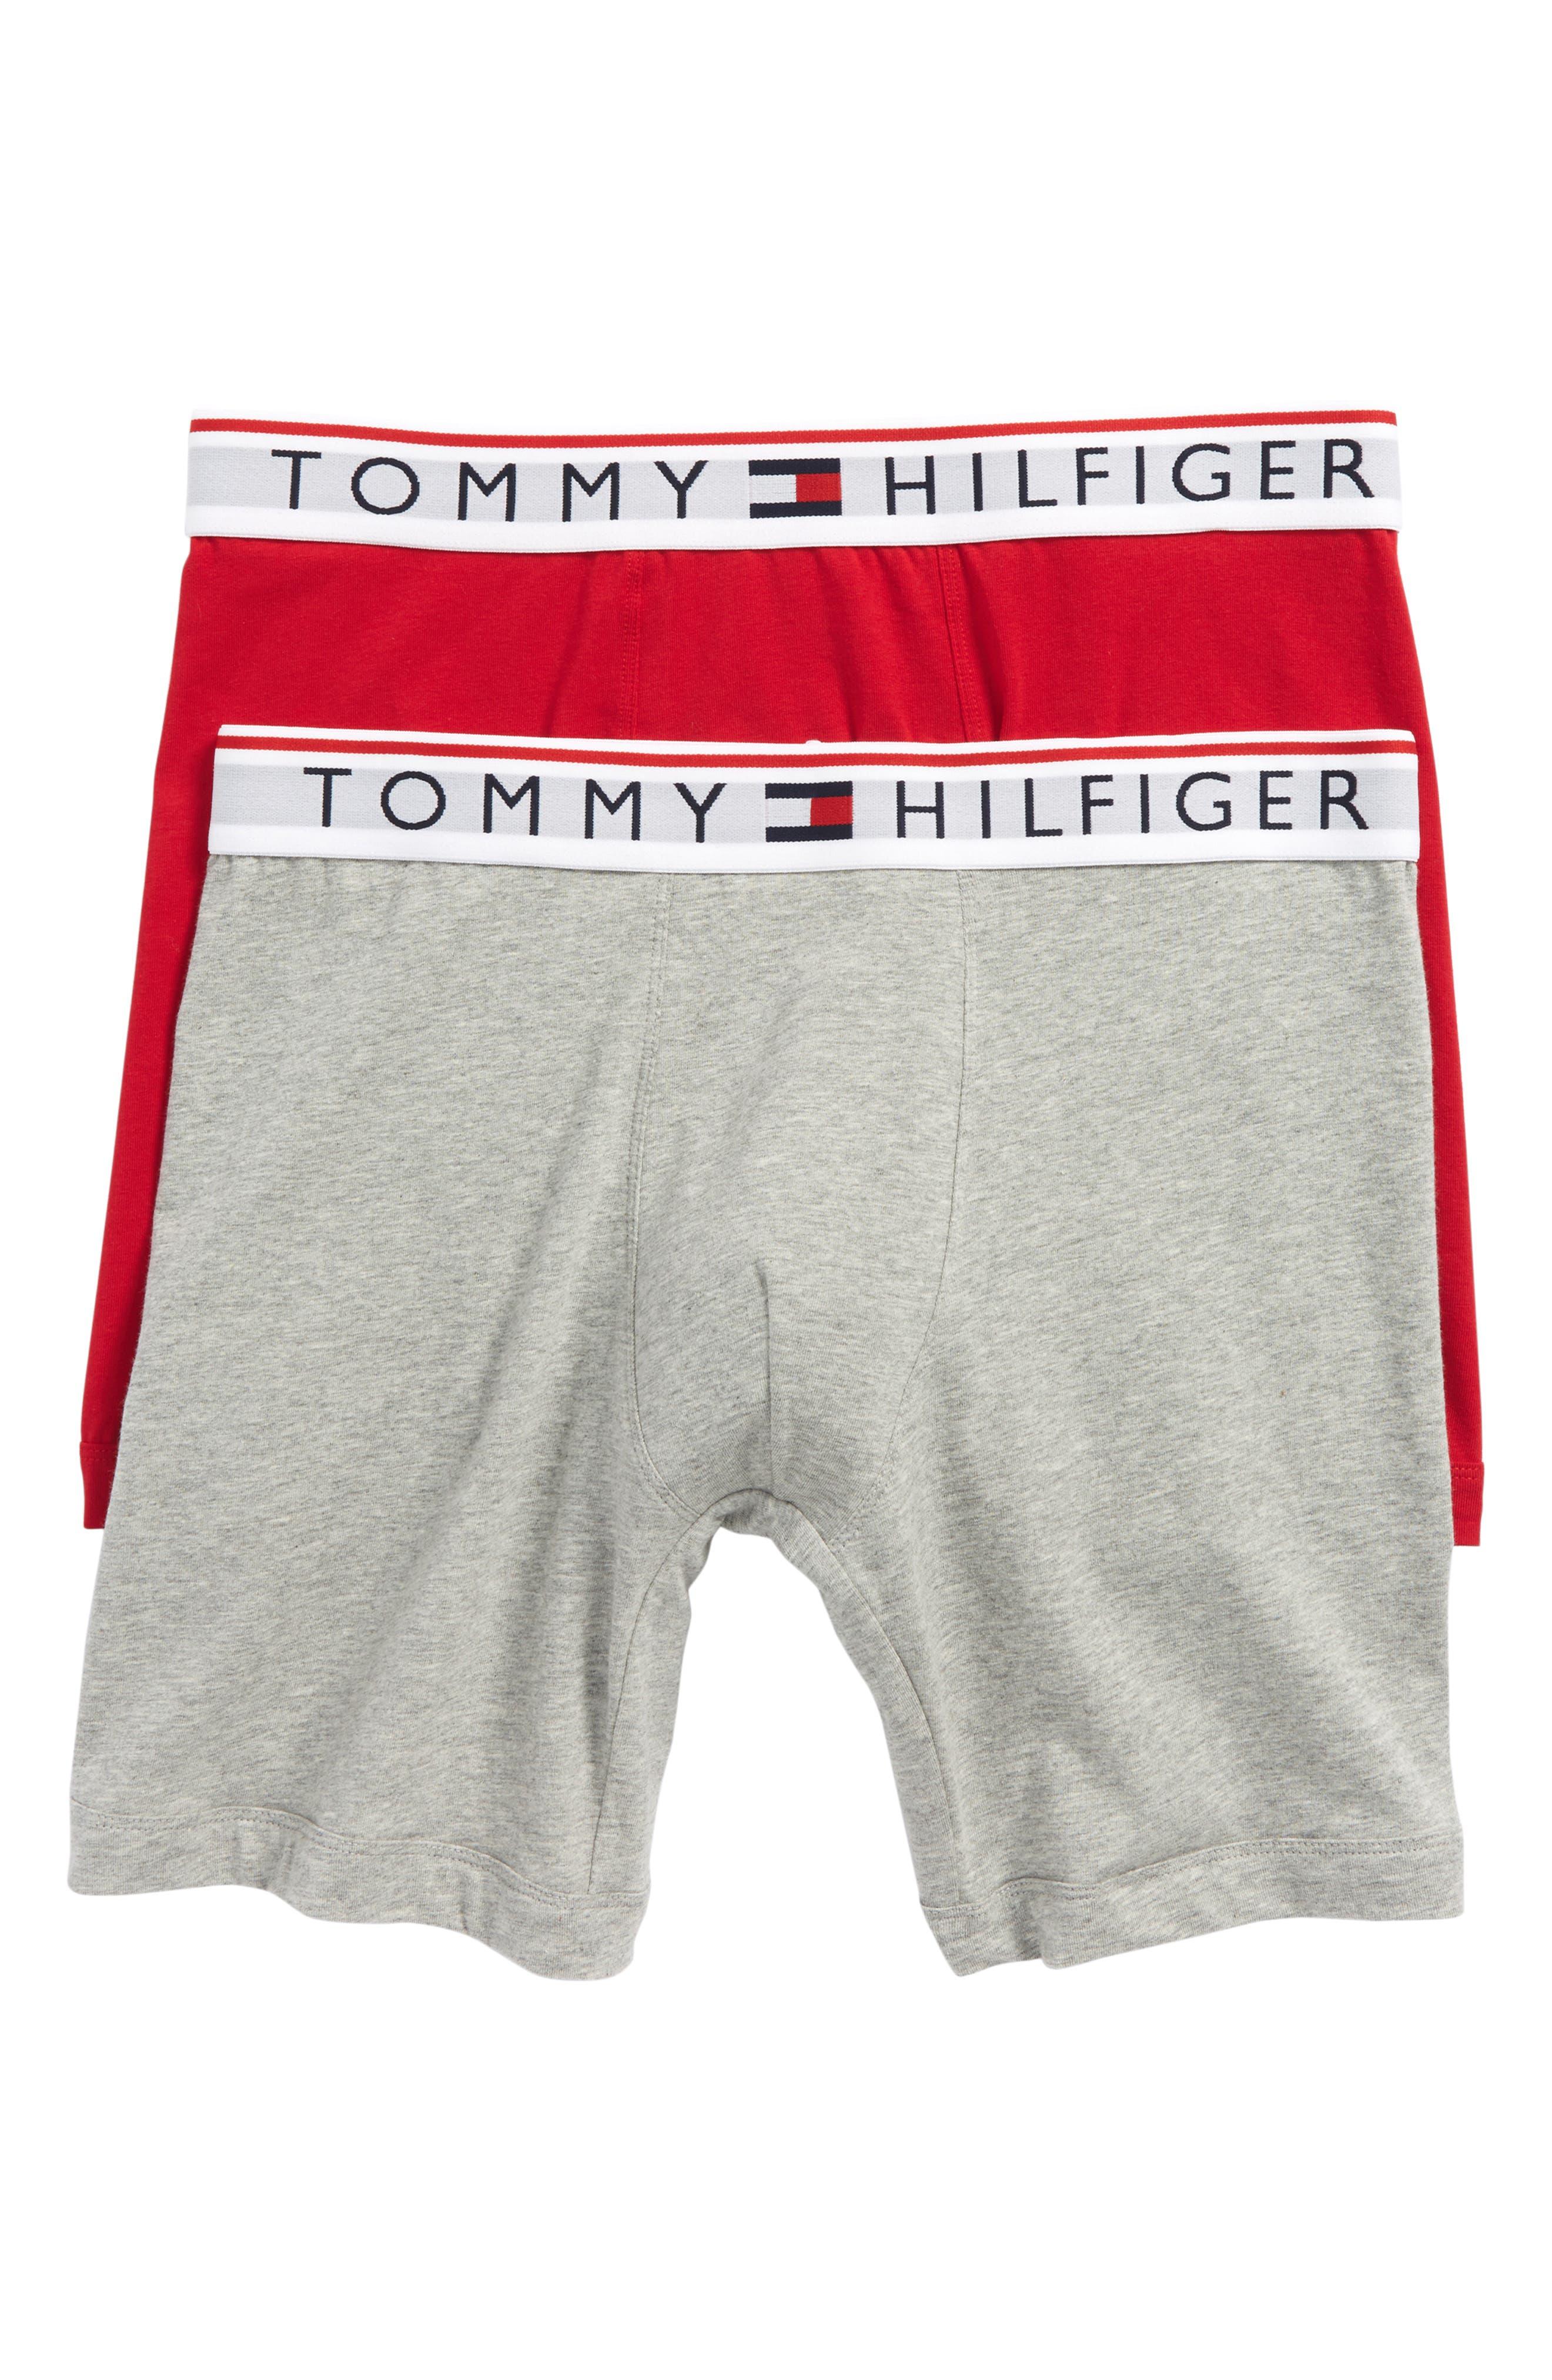 709e40219 Tommy Hilfiger